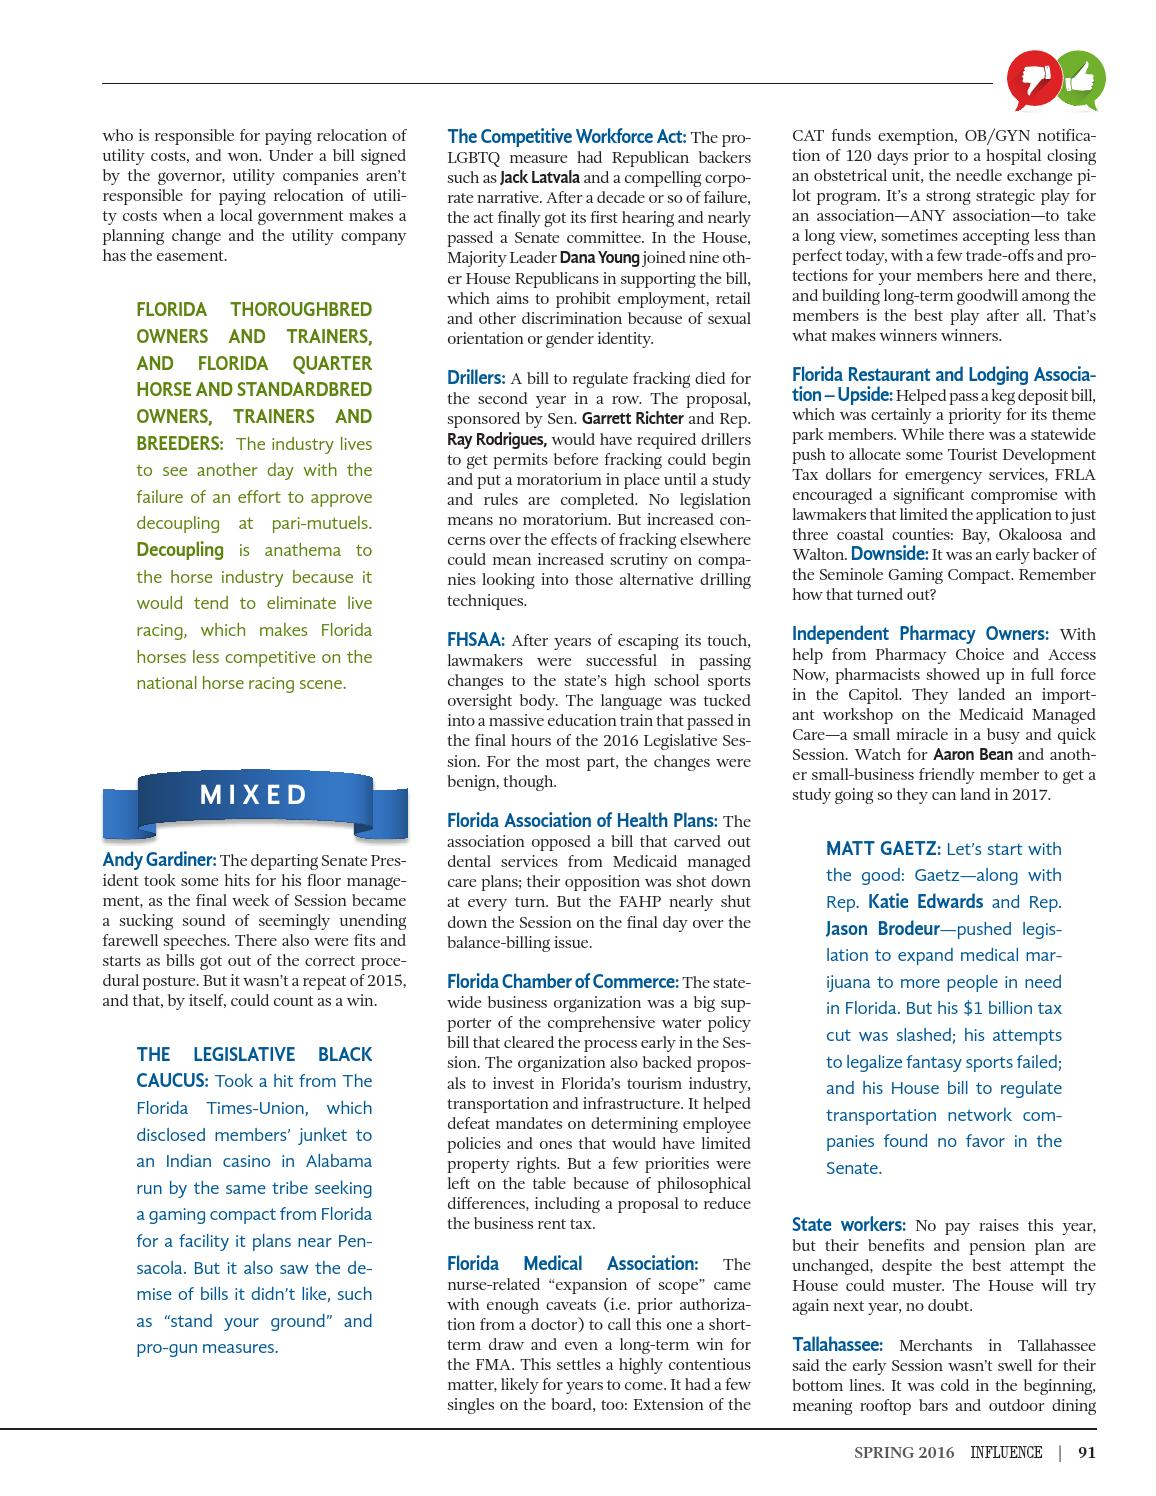 INFLUENCE Magazine — Spring 2016 by Extensive Enterprises